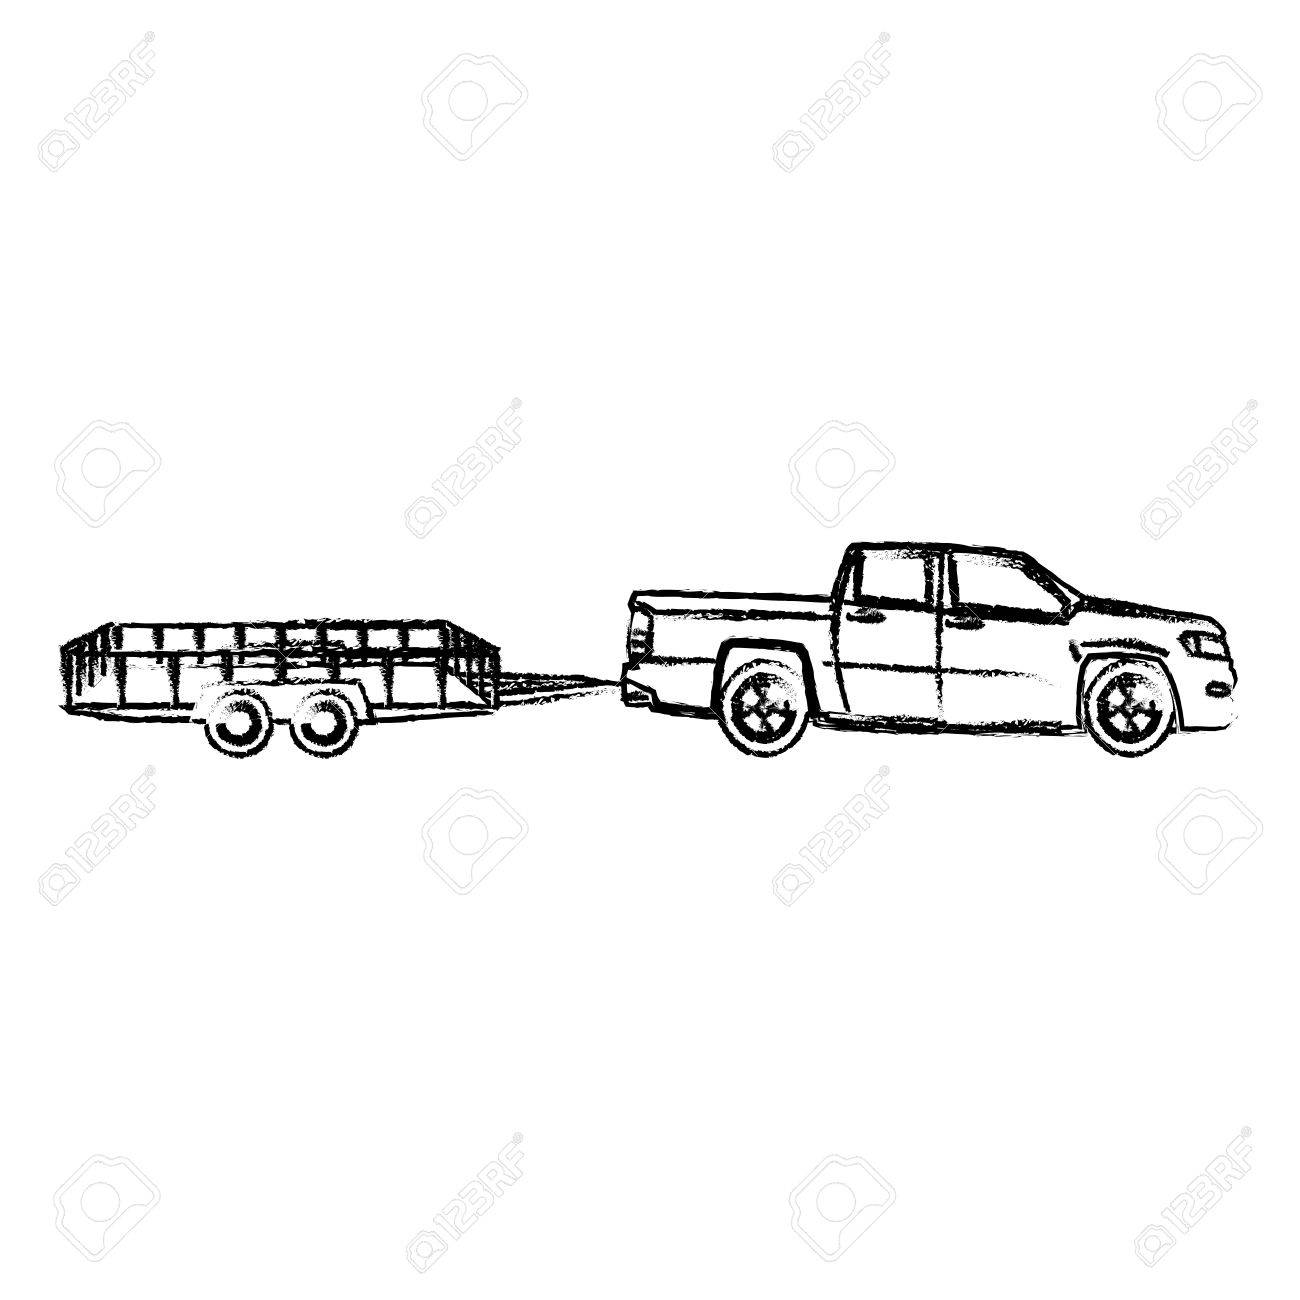 pickup truck trailer cargo shipping image vector illustration.